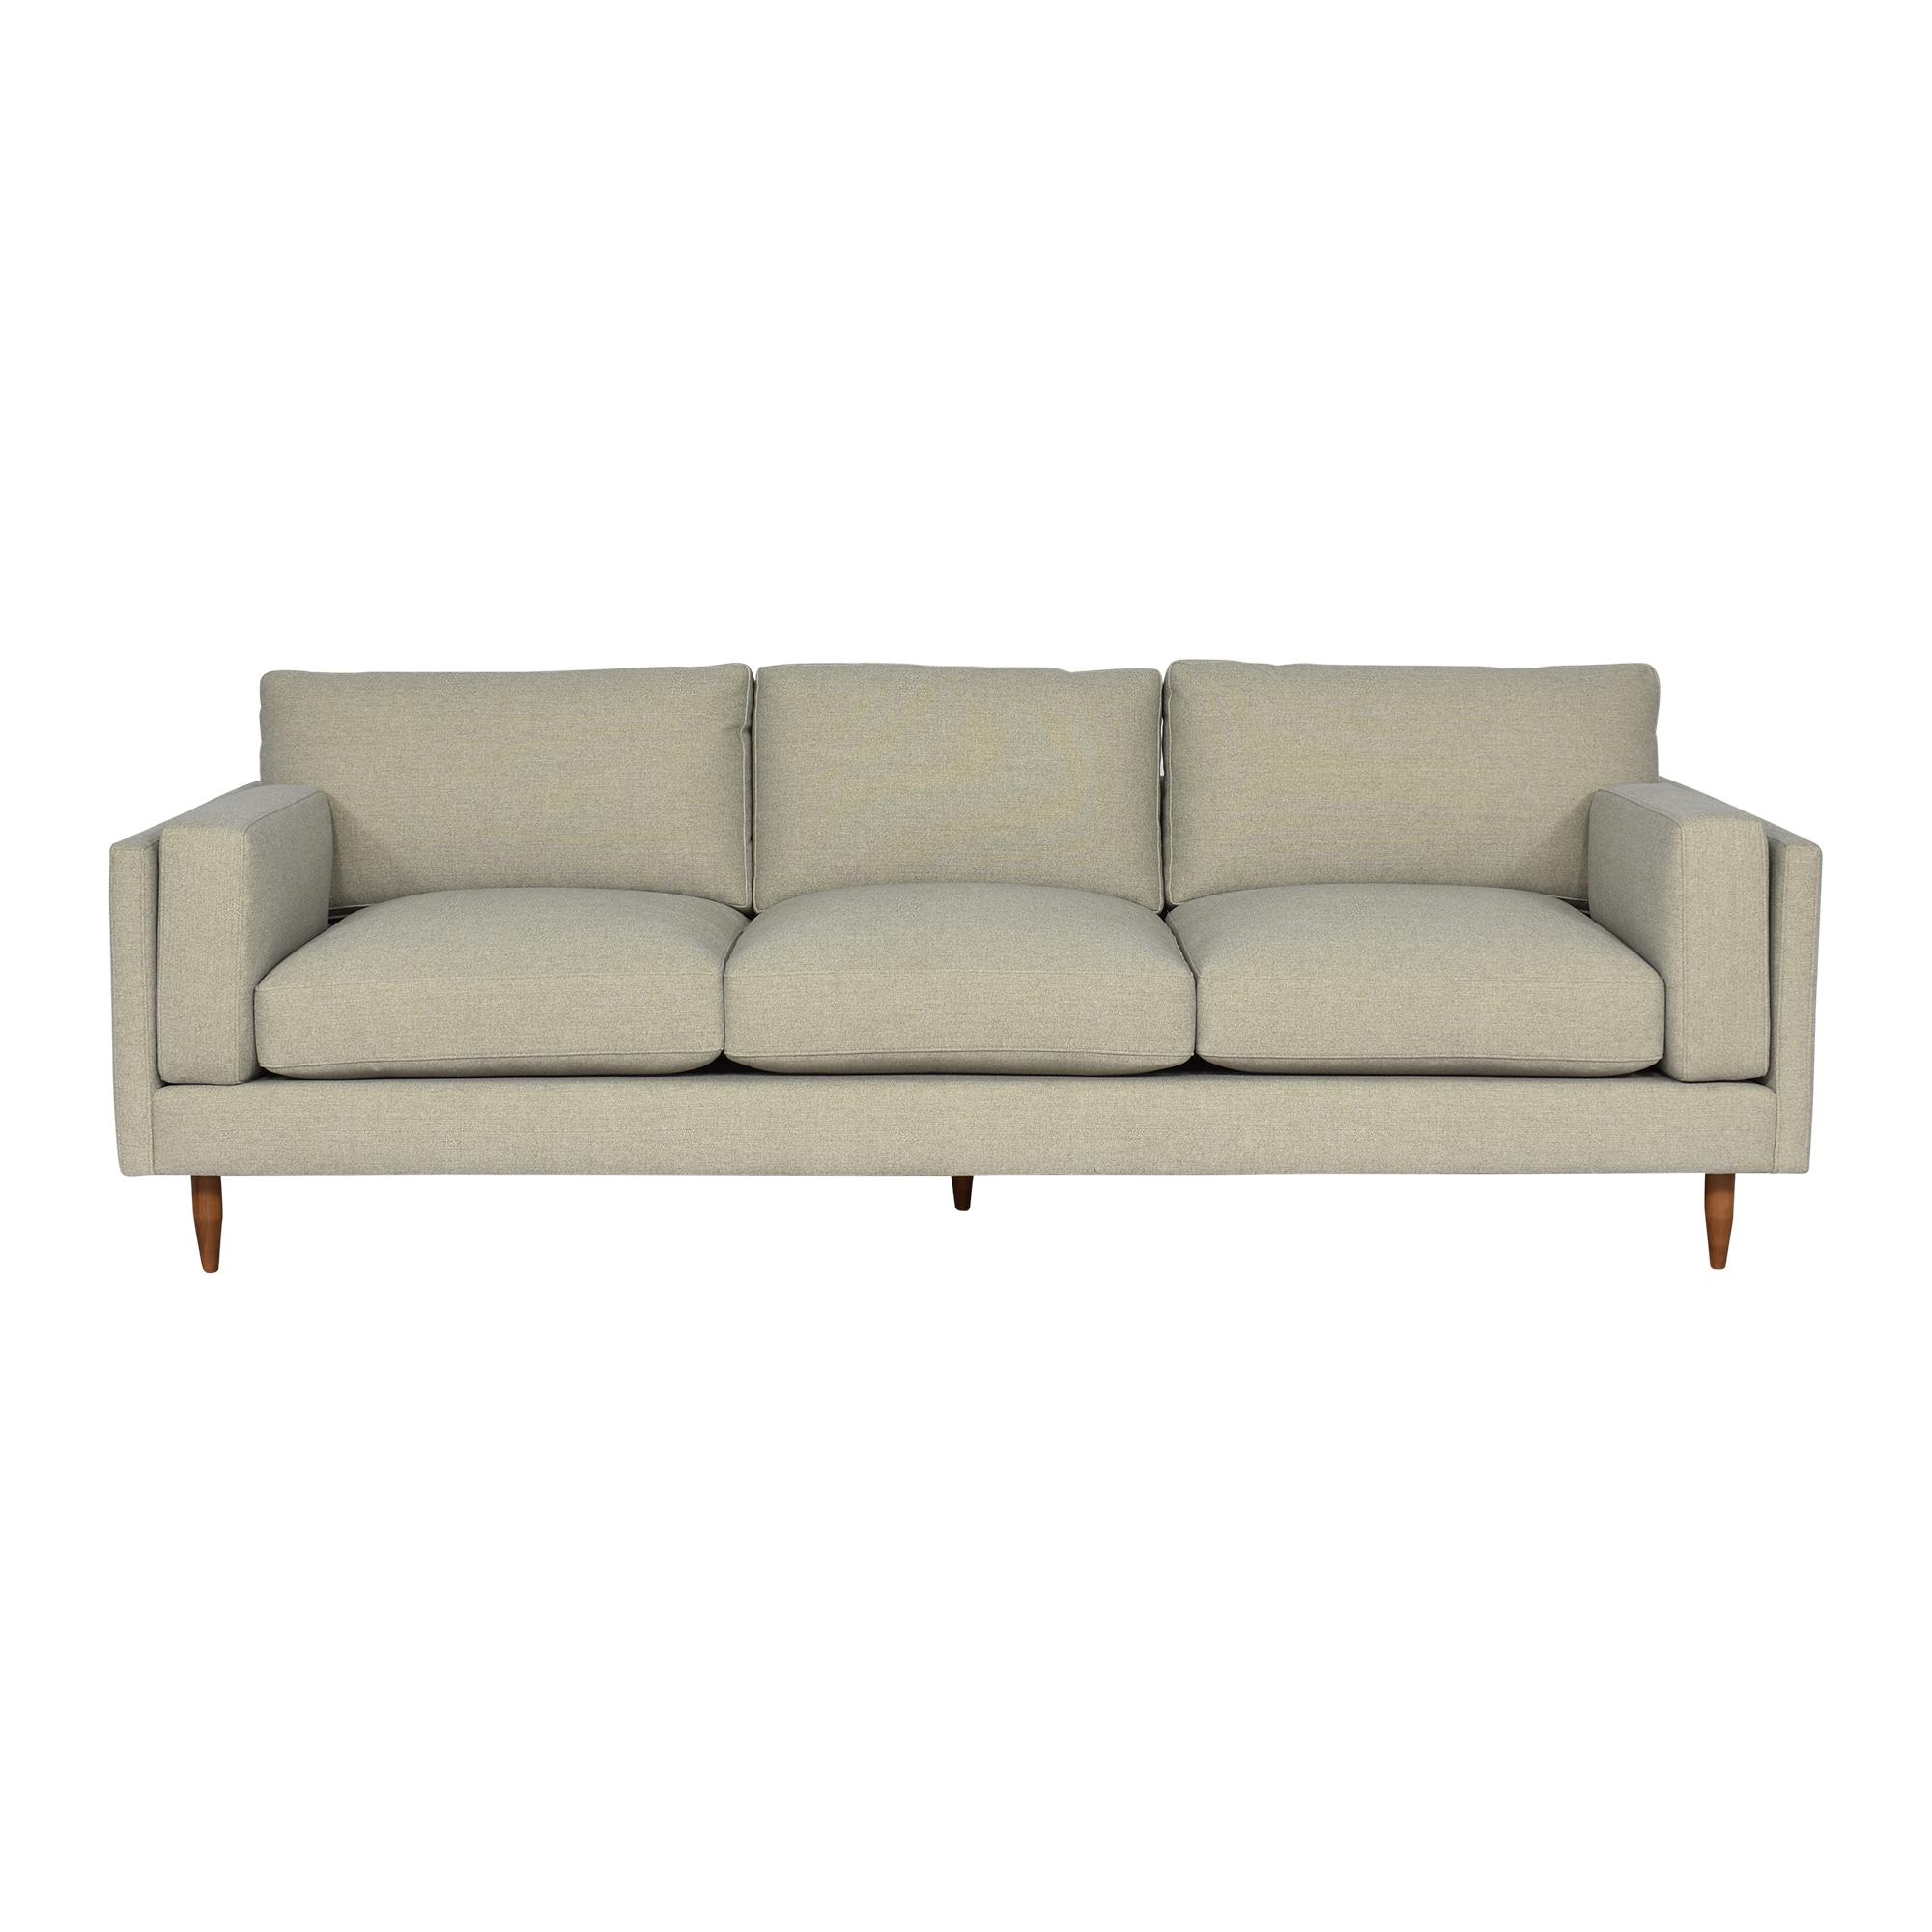 BenchMade Modern Skinny Fat Sofa / Sofas